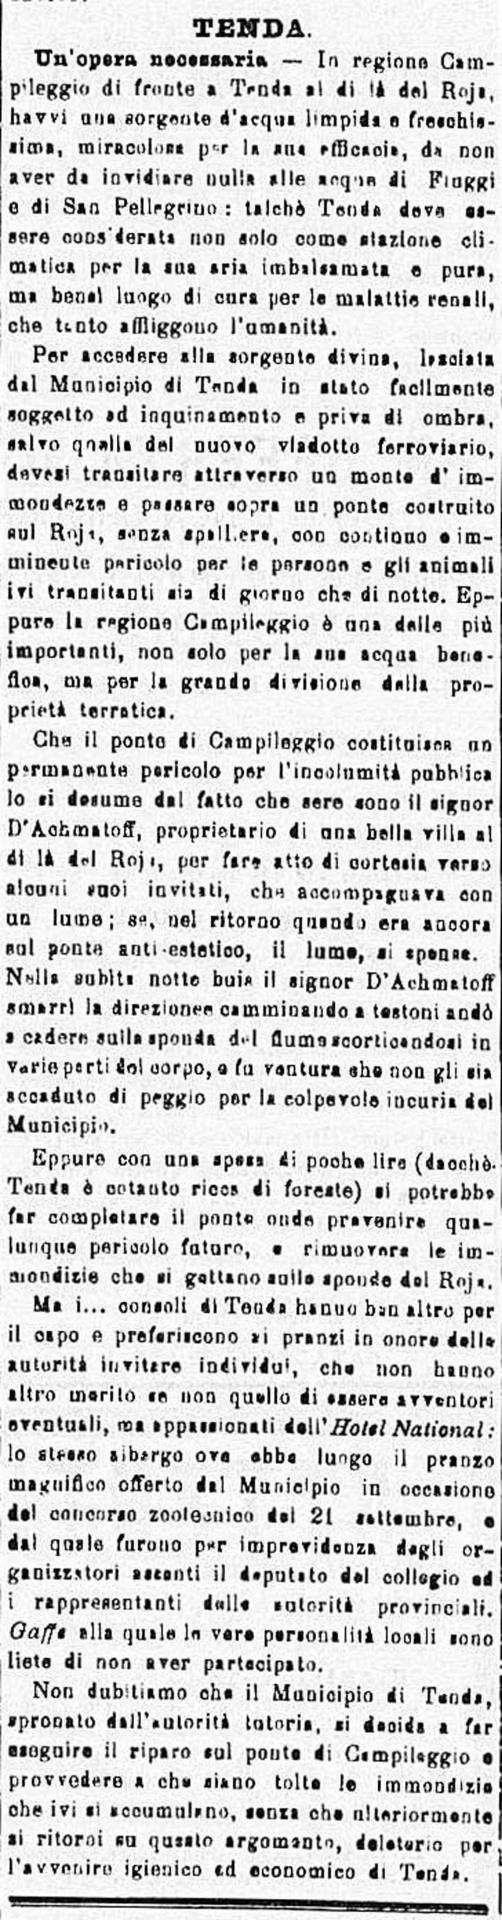 228 du 3 10 1911